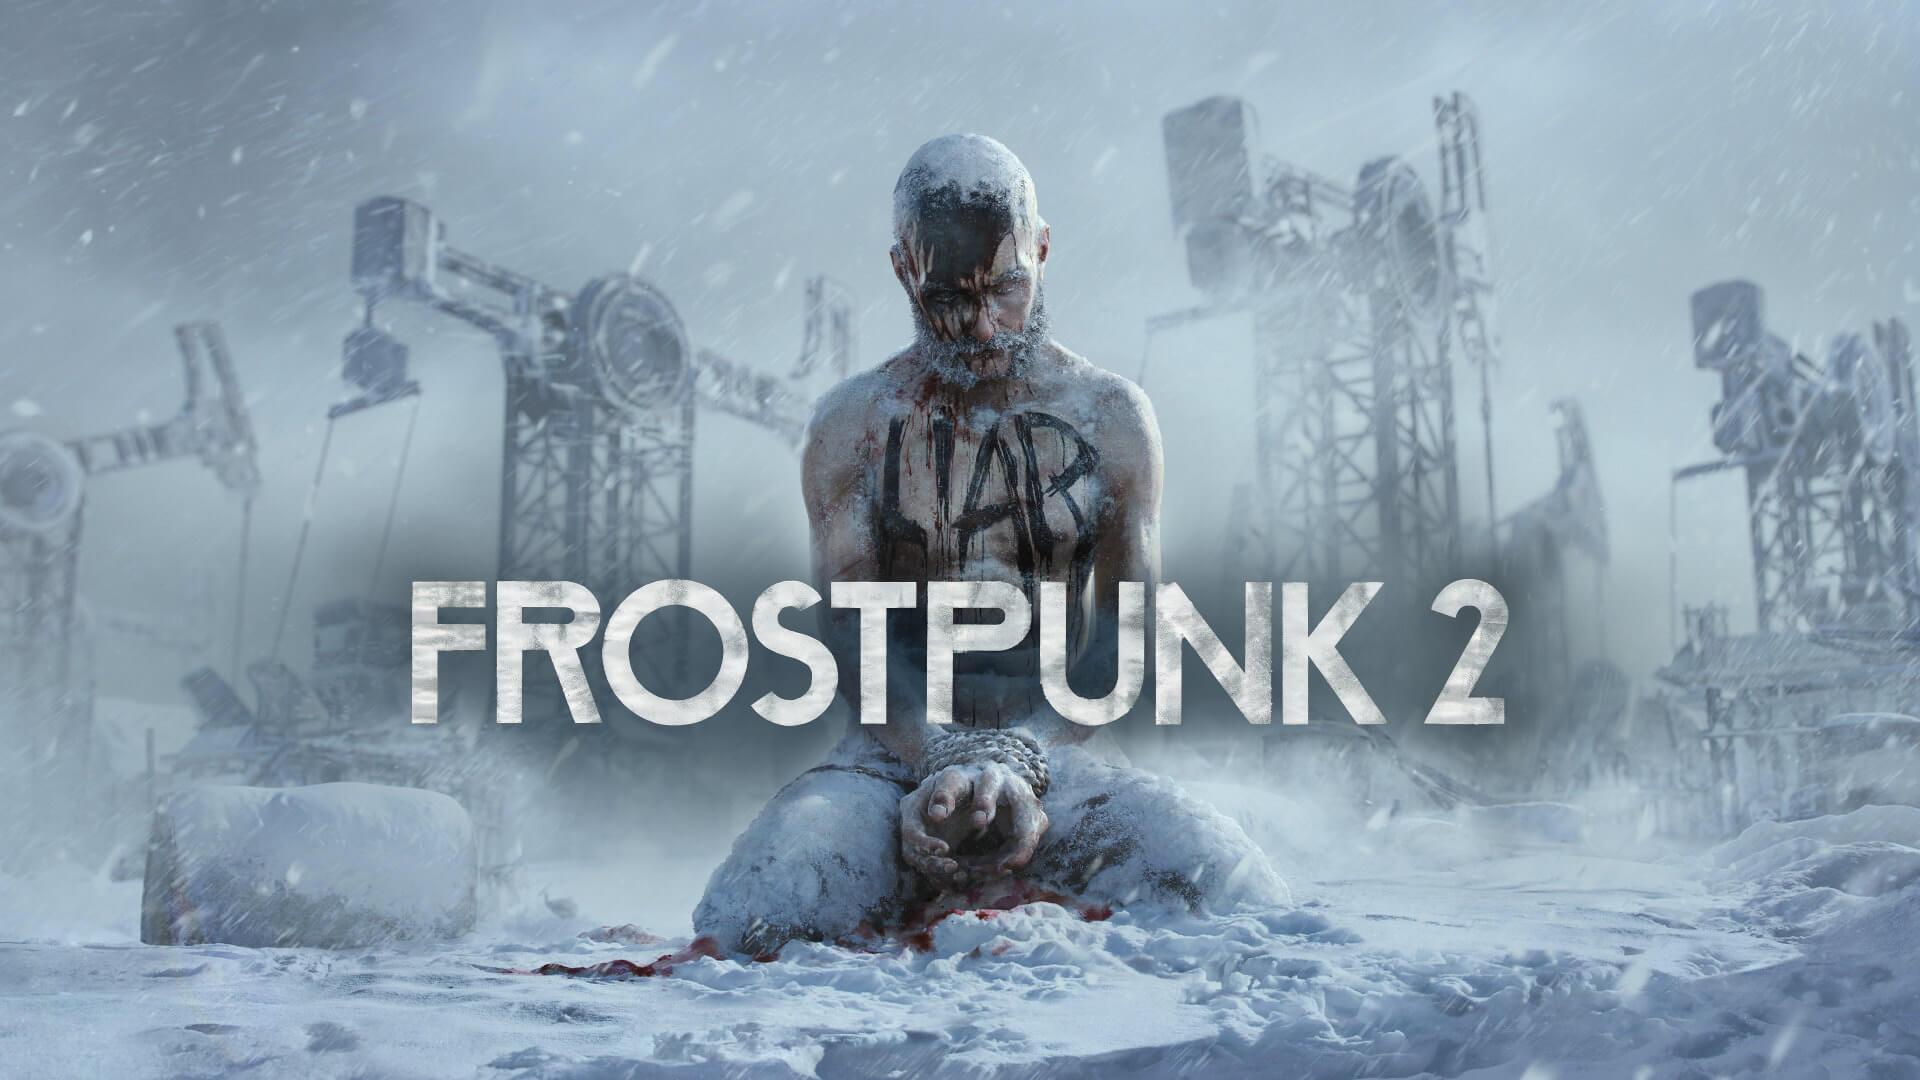 Frostpunk 2 Liar Key Art